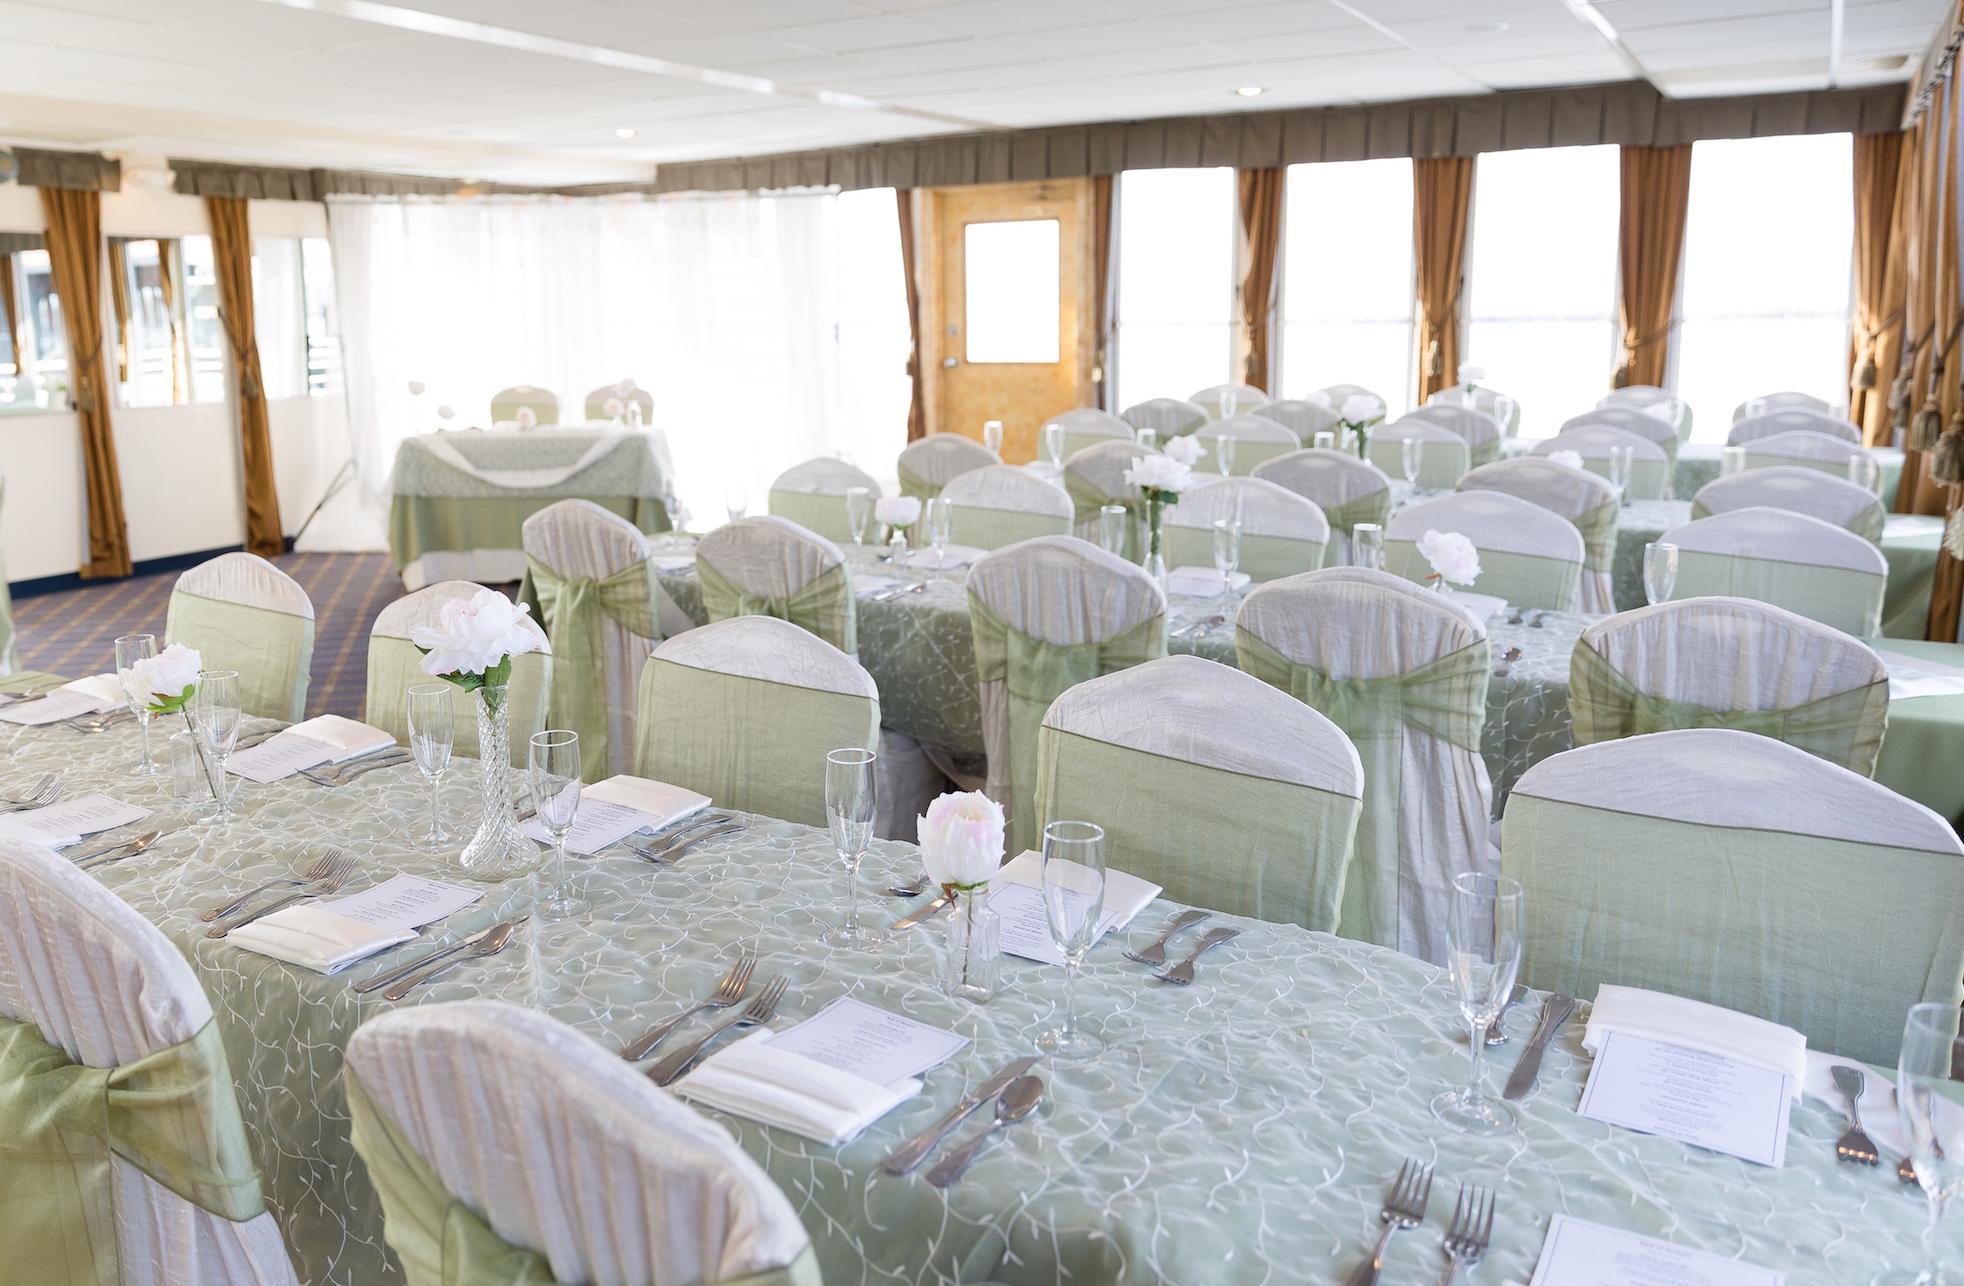 Weddings – Spirit of Ethan Allen